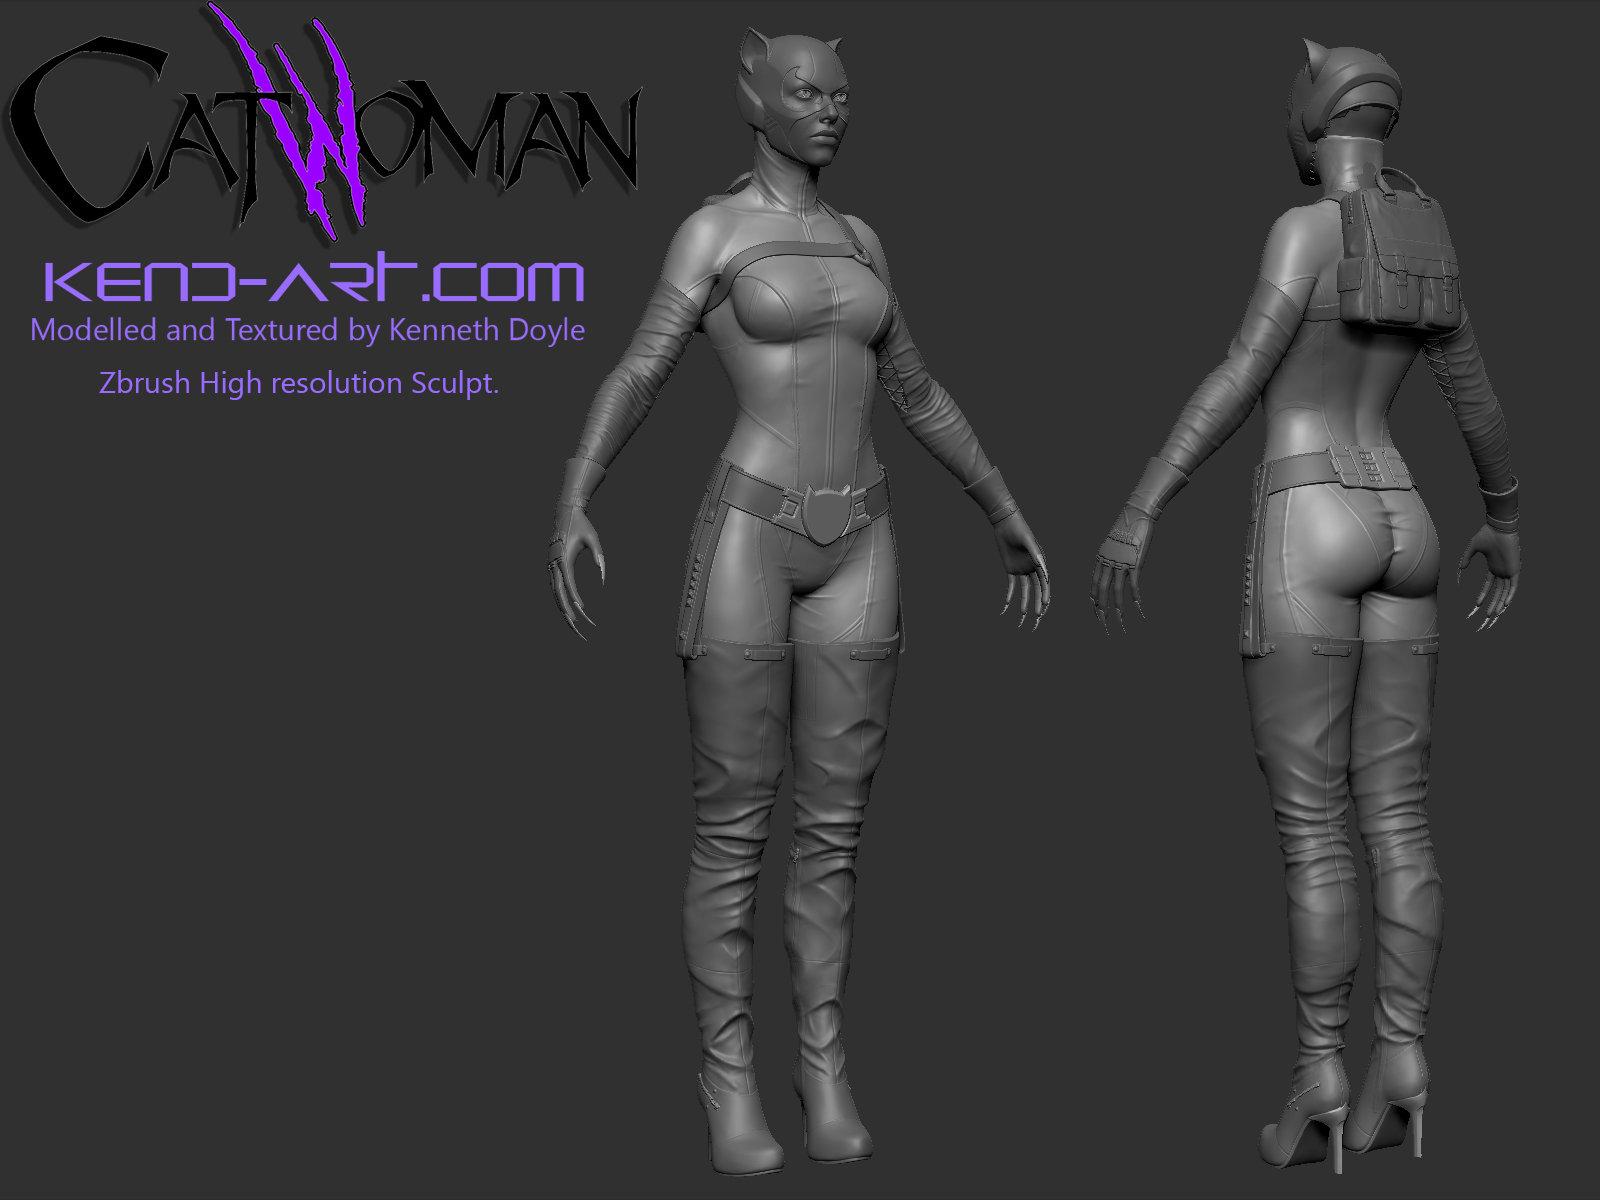 Kenneth doyle catwoman7